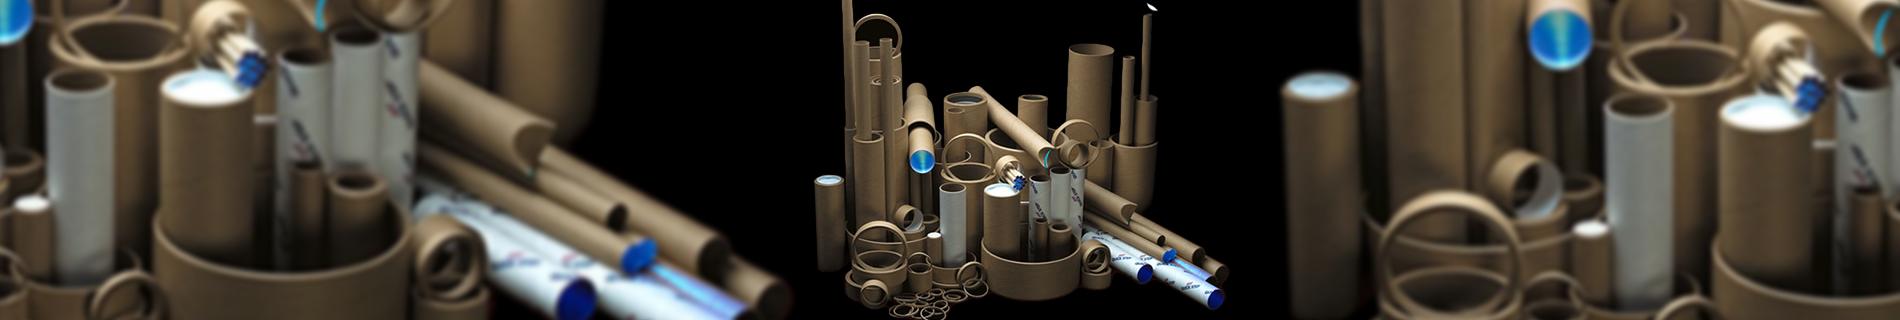 fresh tubes